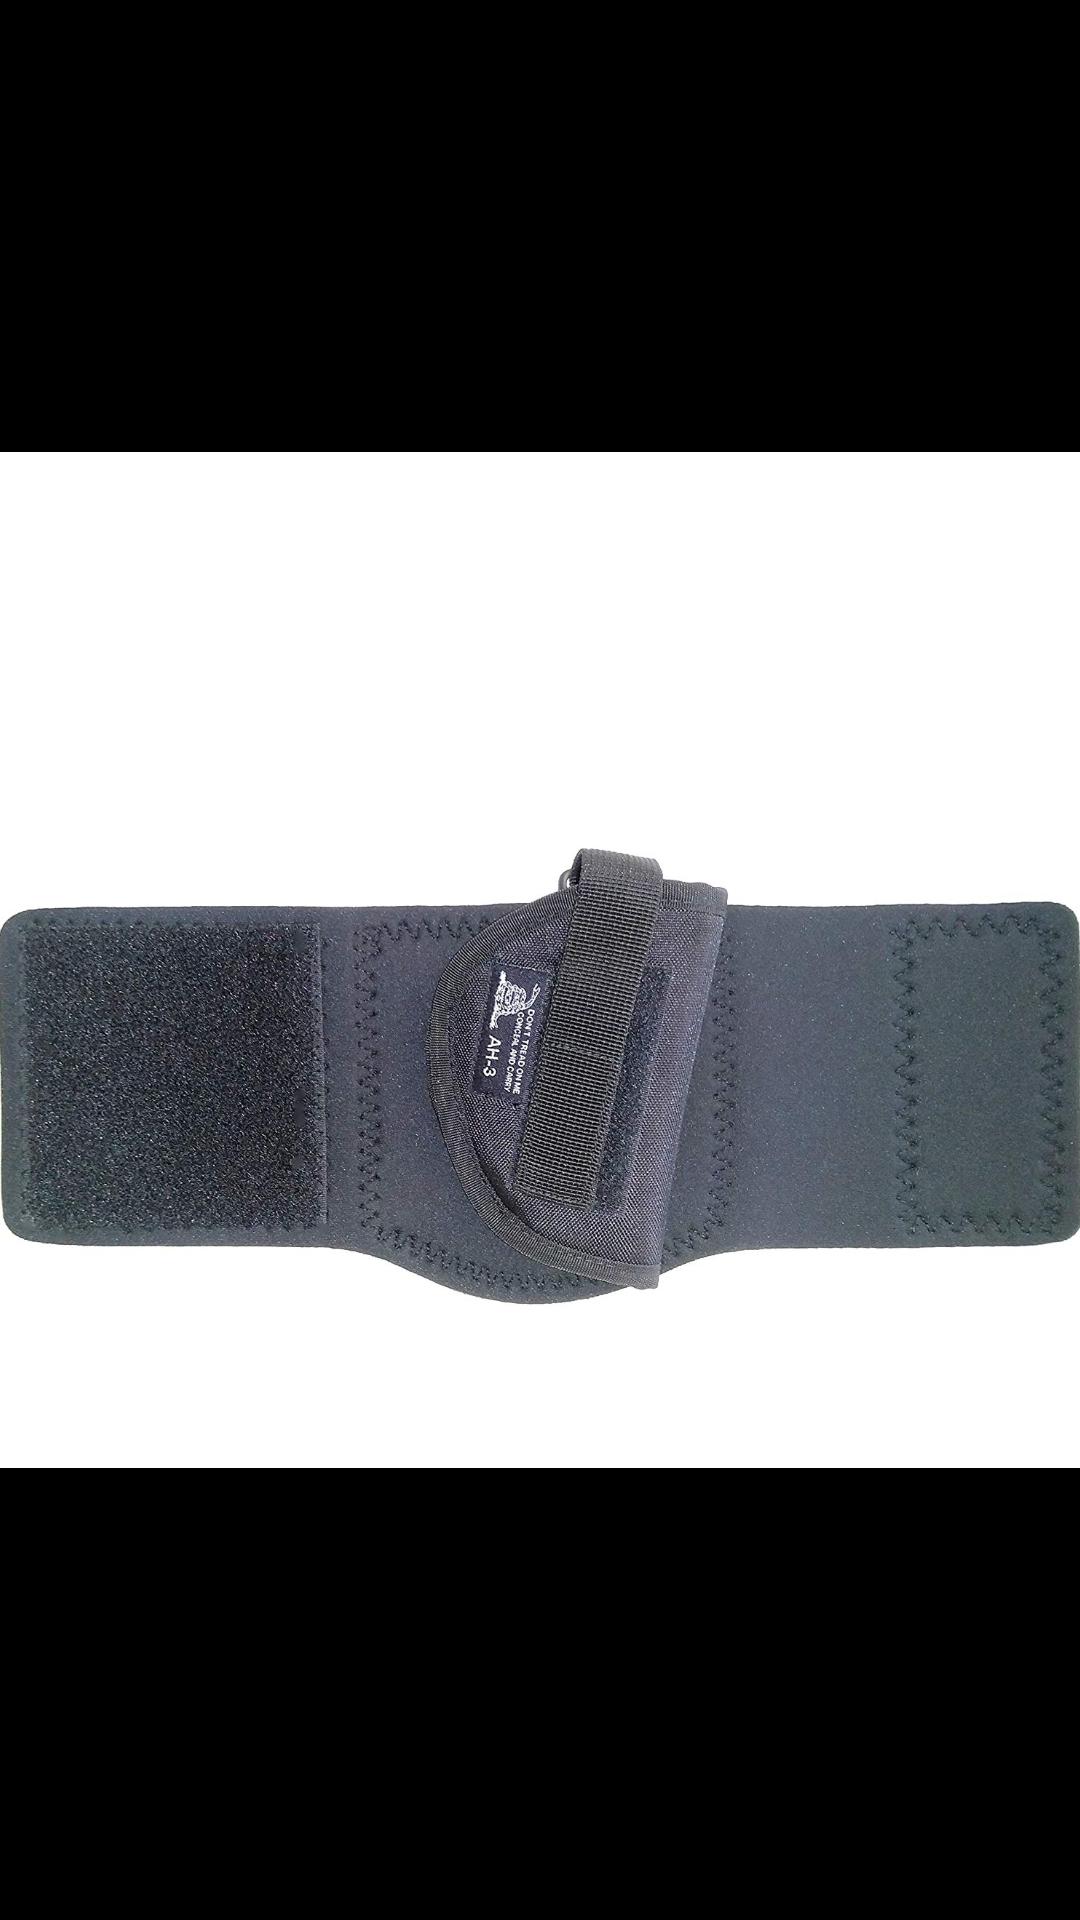 Ankle holster for LCPII-screenshot_20191125-090733_gallery_1574694543206.jpg